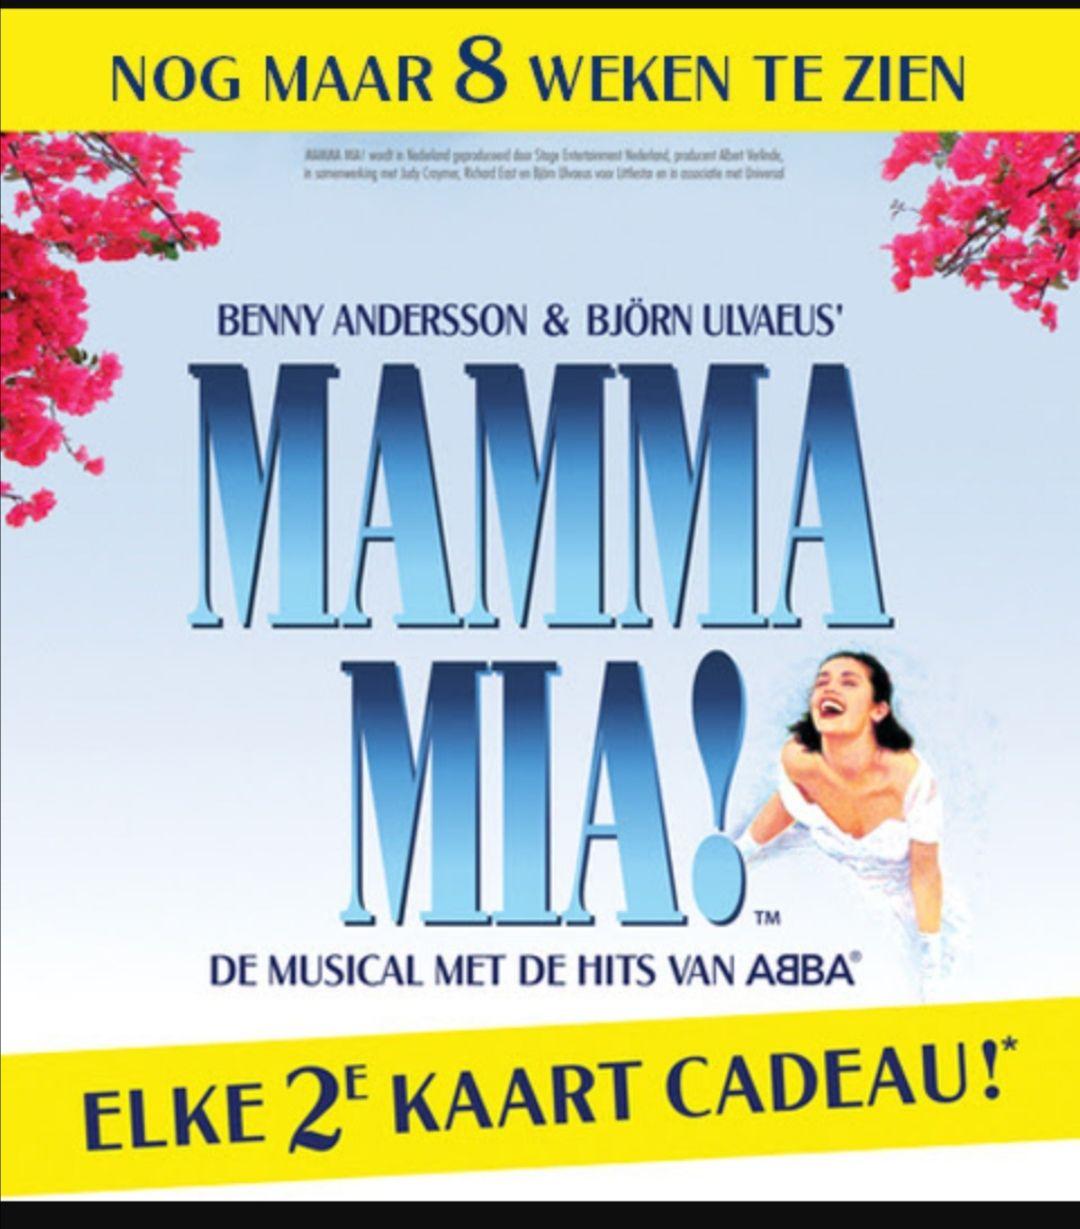 Mamma Mia! Musical 2e kaartje cadeau zonder ergens een abonnee te worden